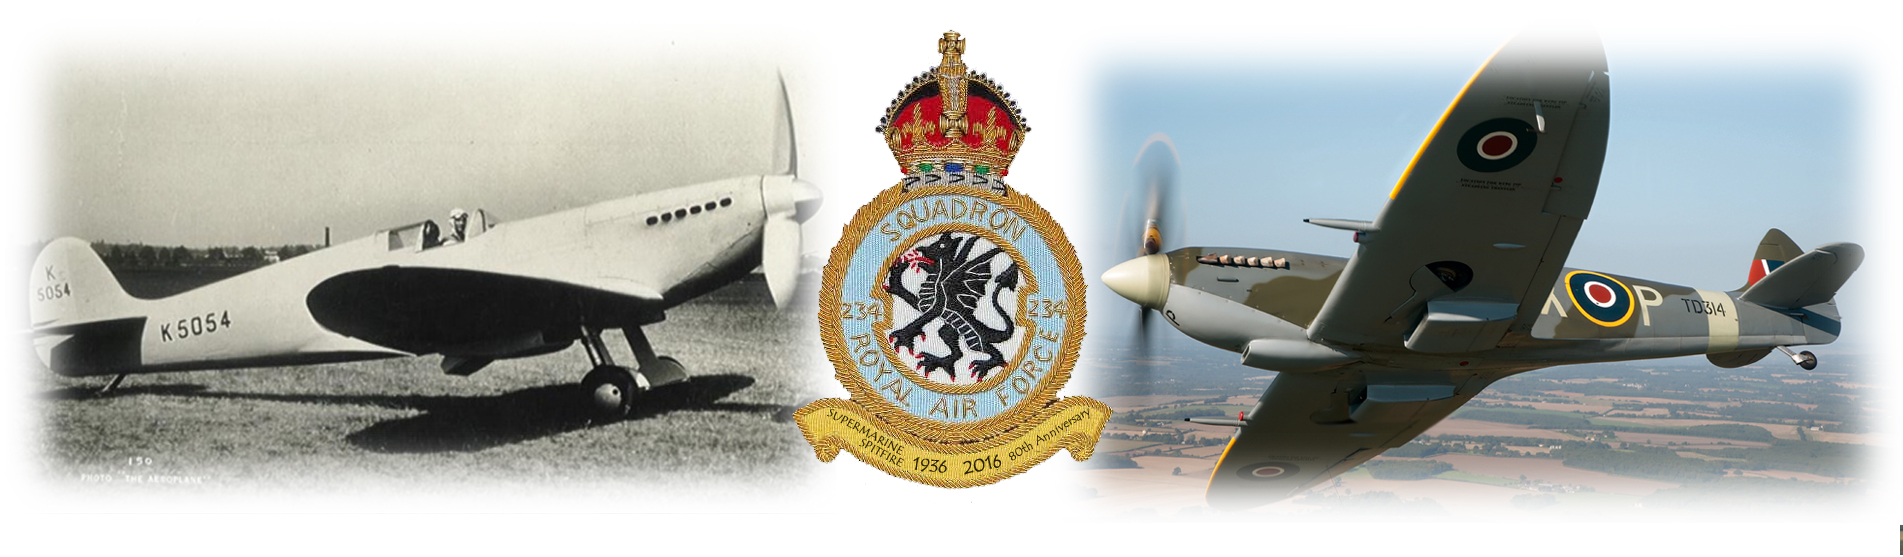 Spitfire80thAnniBanner2